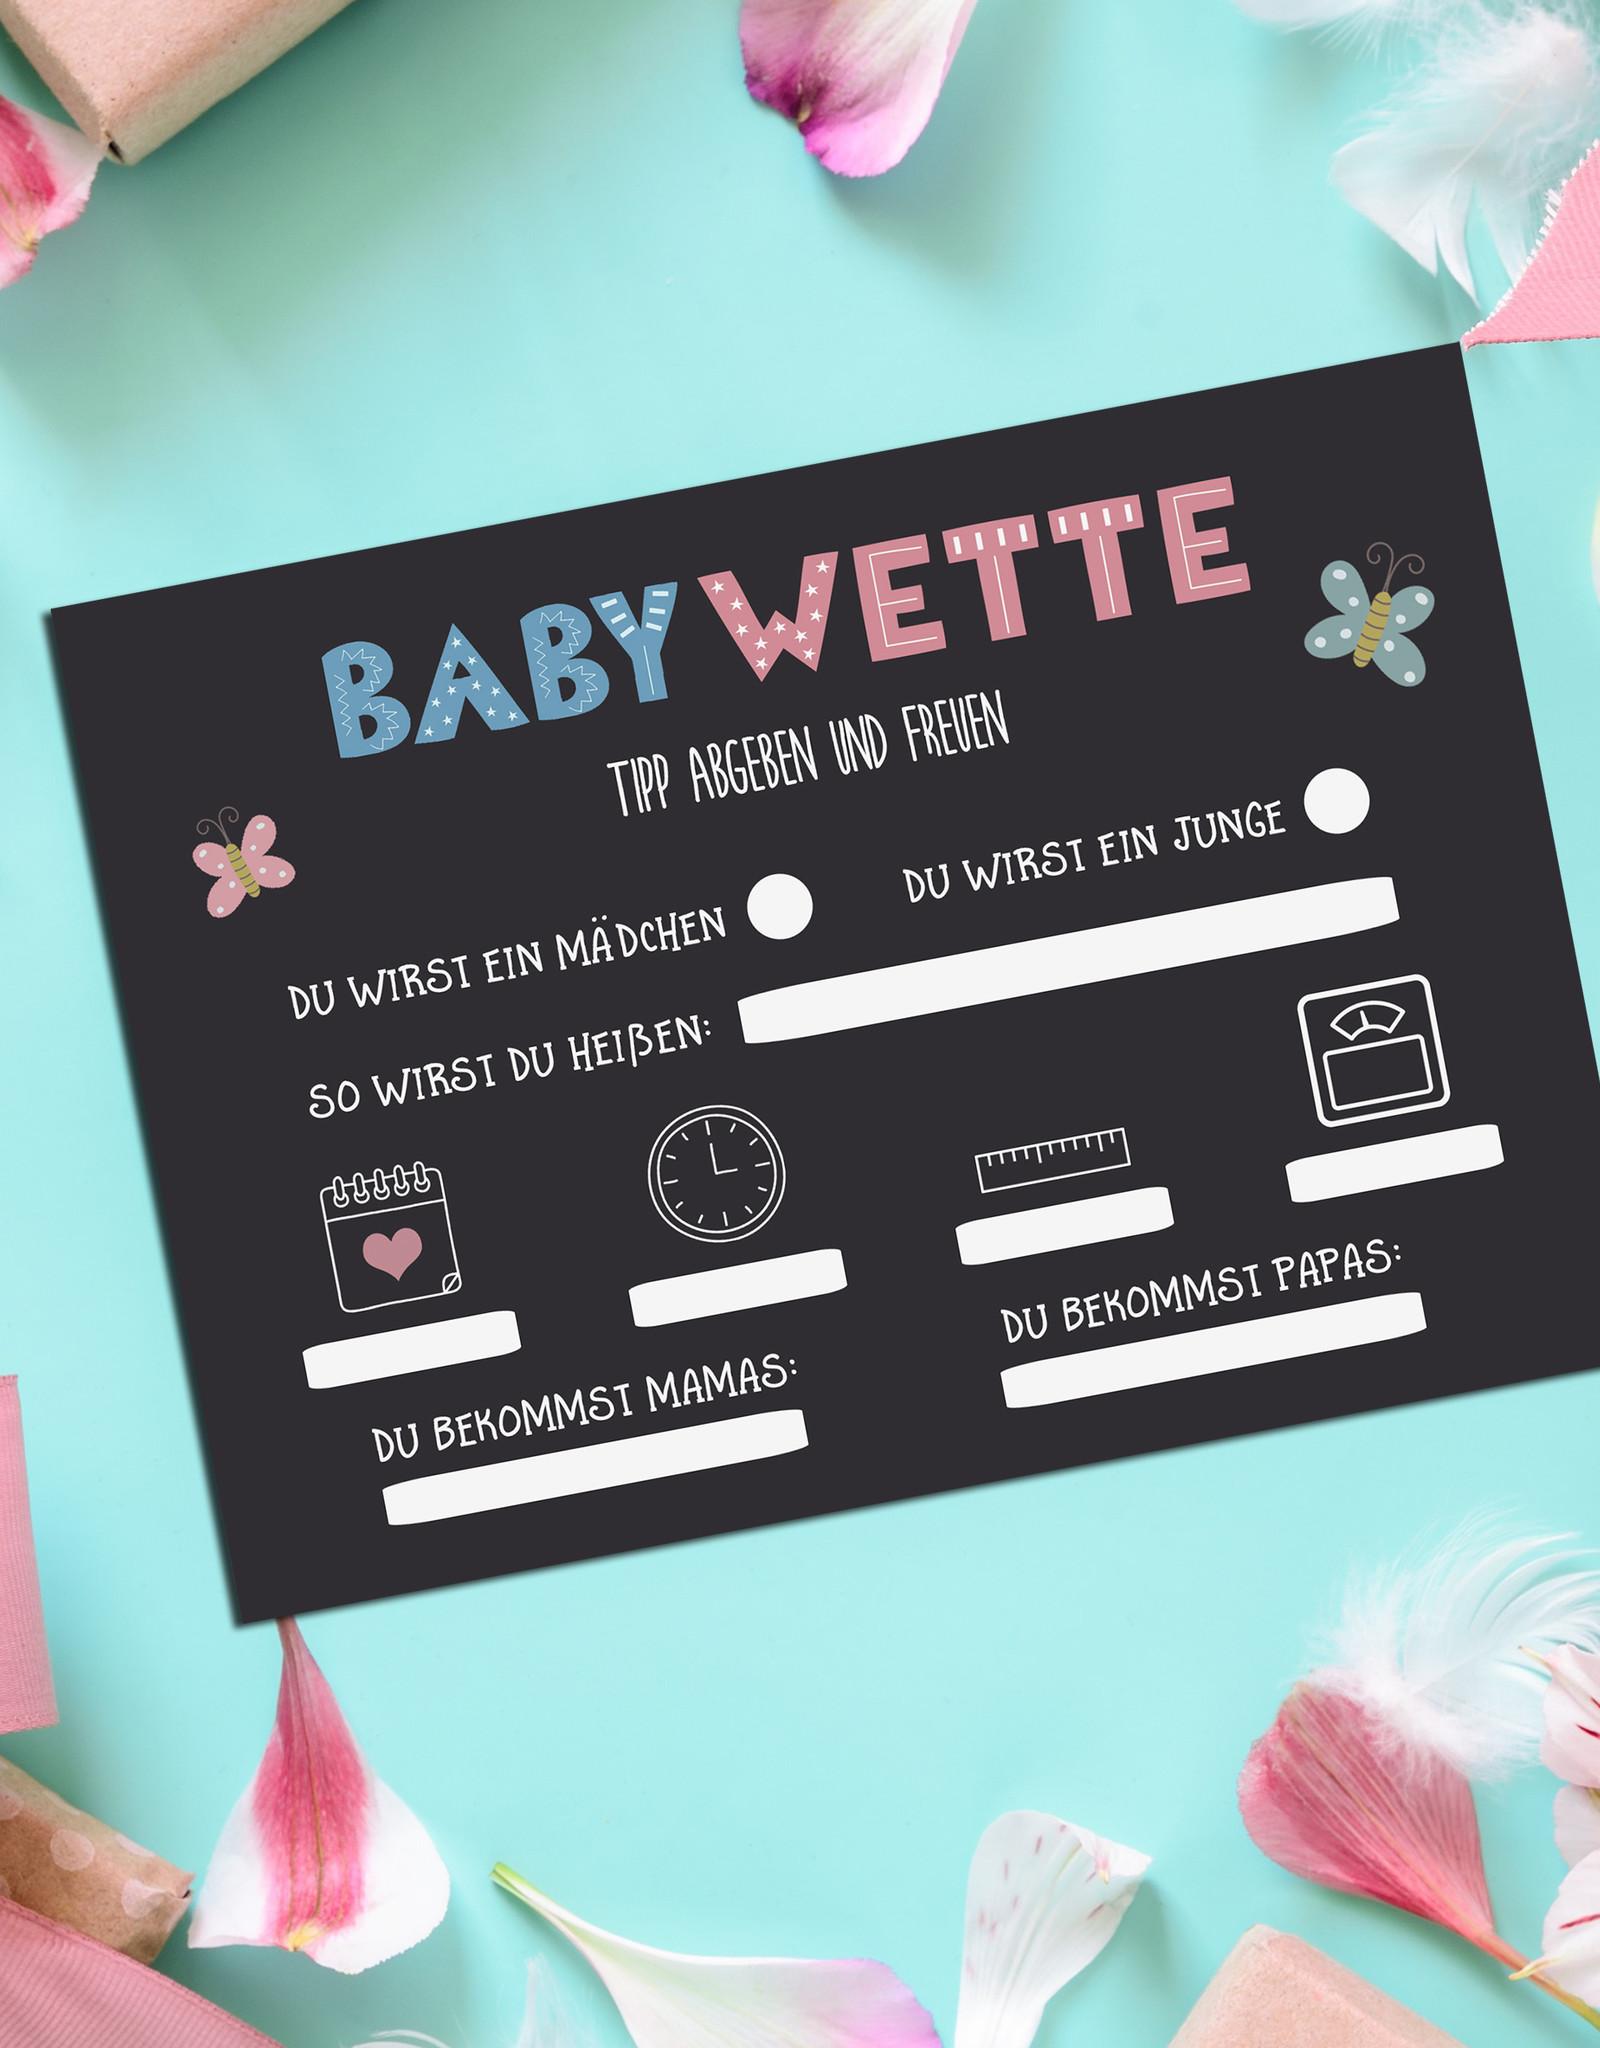 25 x Baby Tippkarten Geschlecht Baby Ratekarten Babyparty Spiele Baby Wette